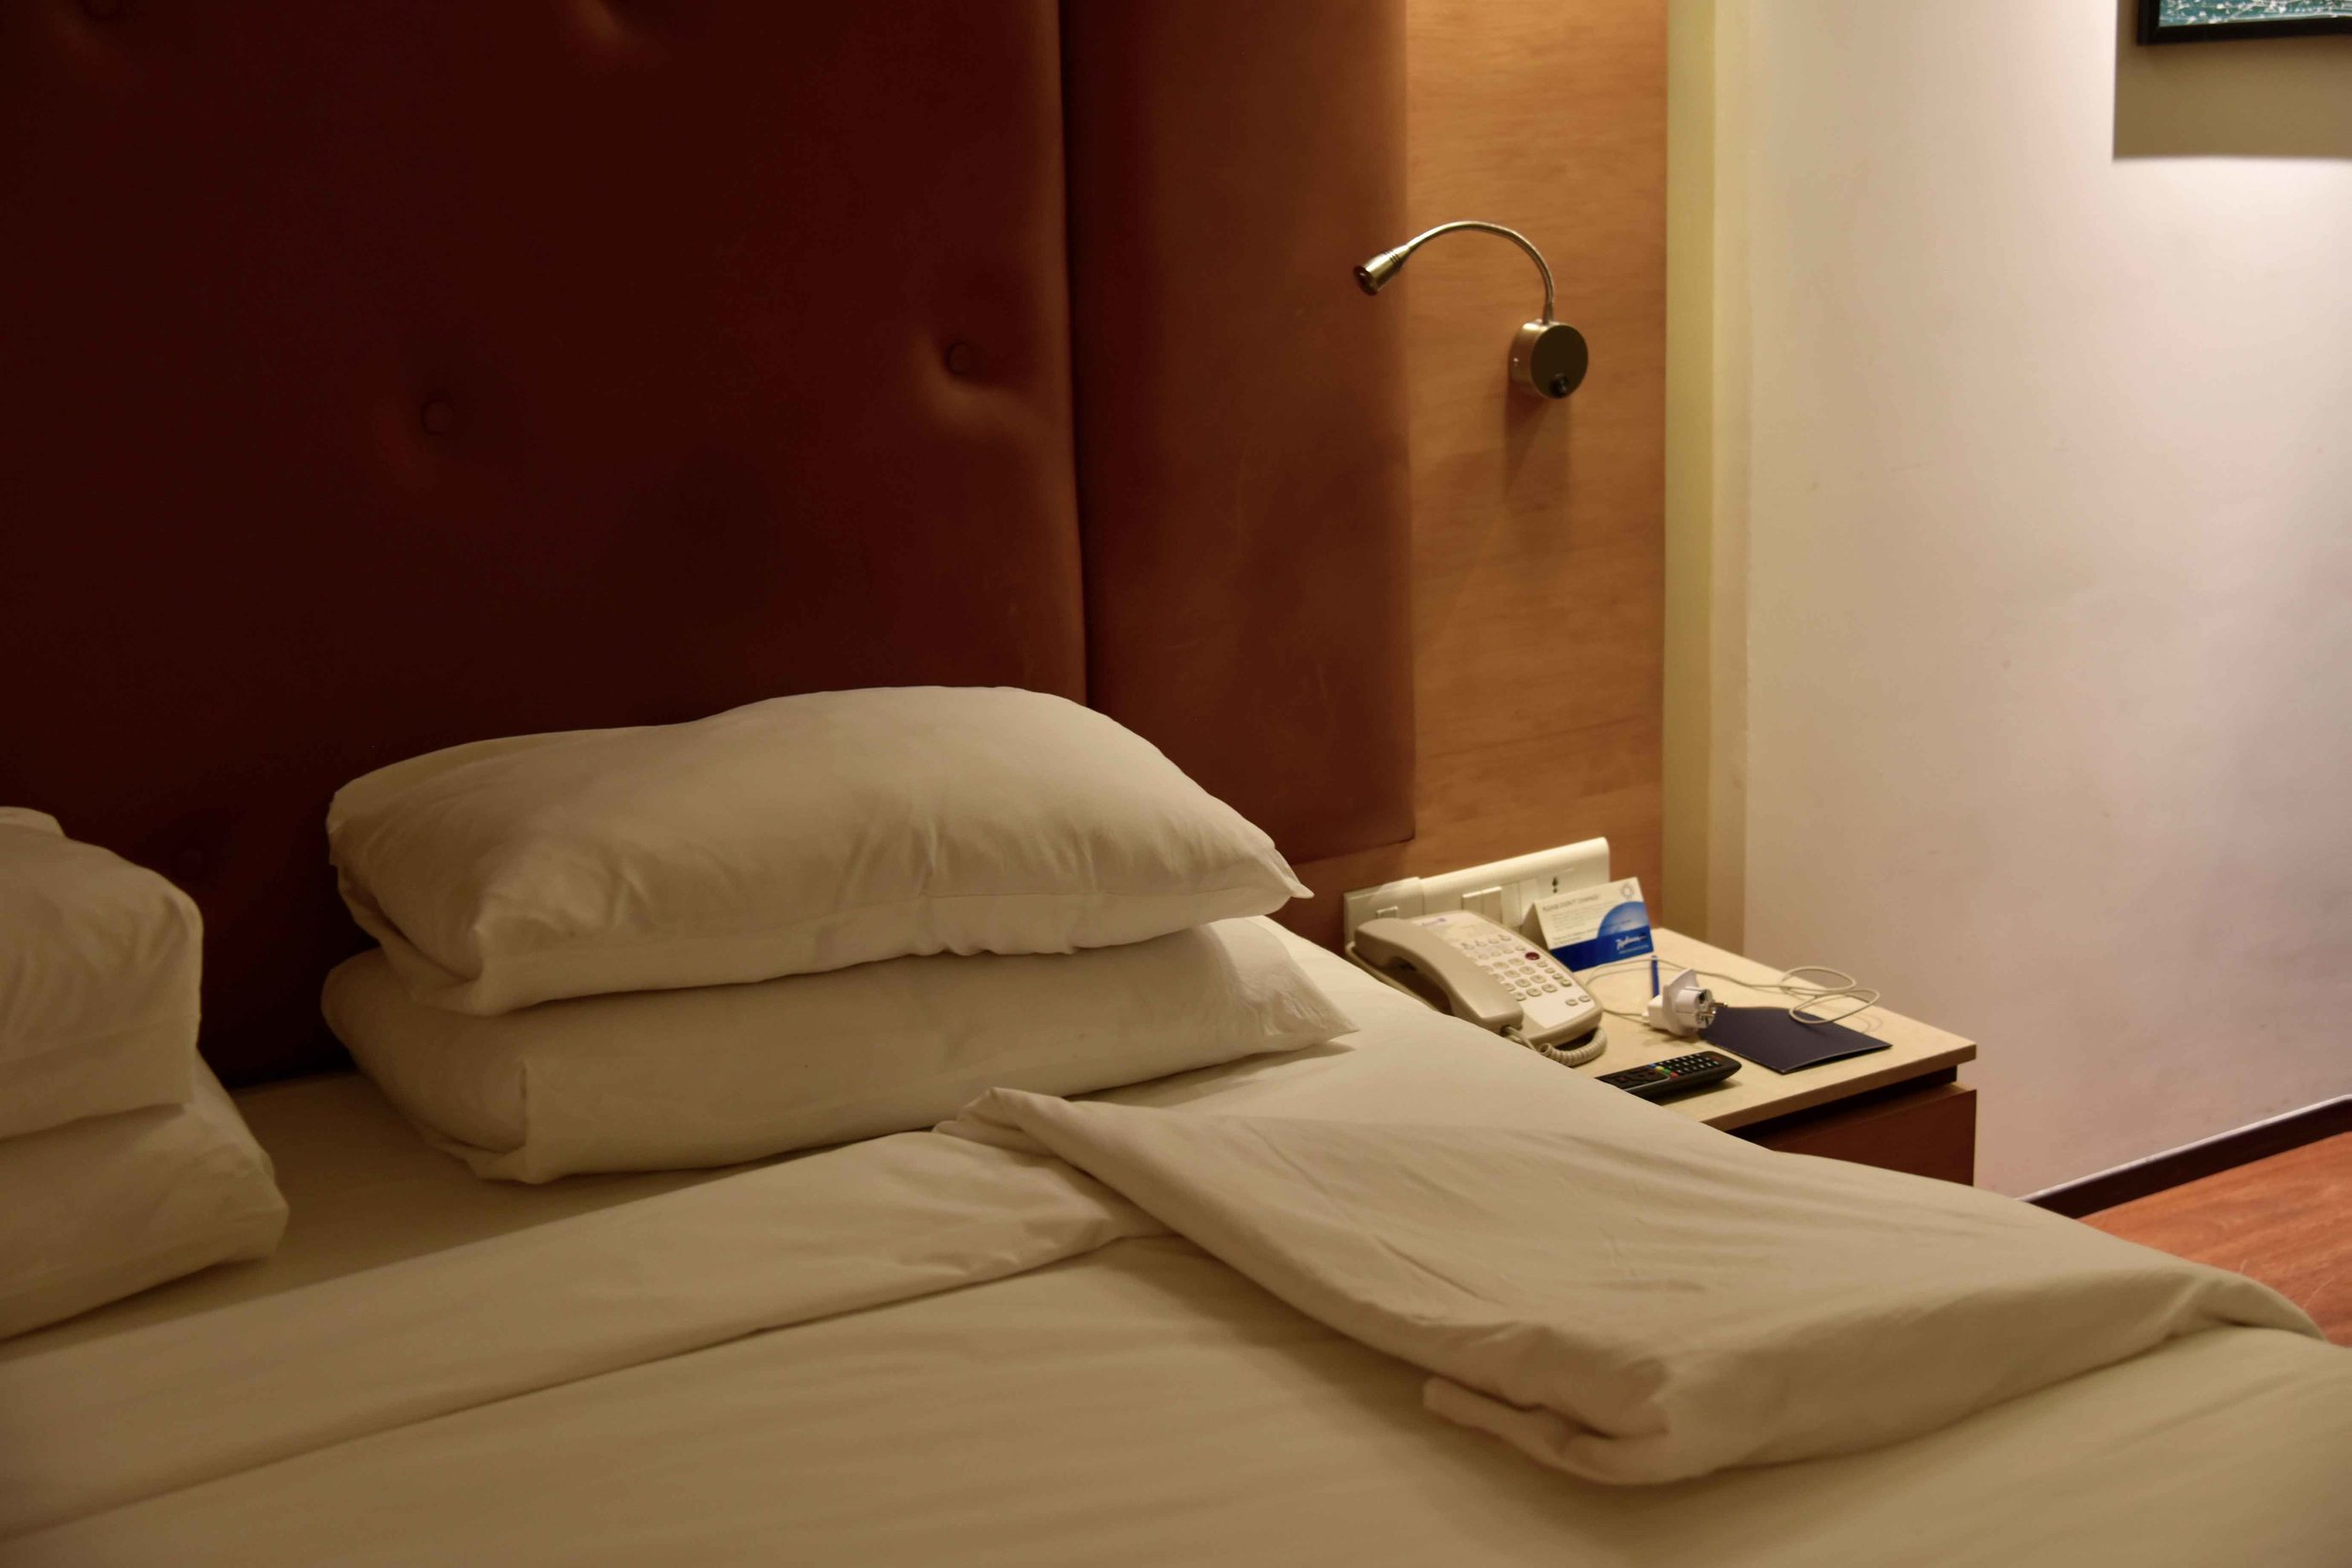 Evening turndown service, Radisson Blu Hotel, lobby area, Ranchi, Jharkhand, India. Image©sourcingstyle.com.